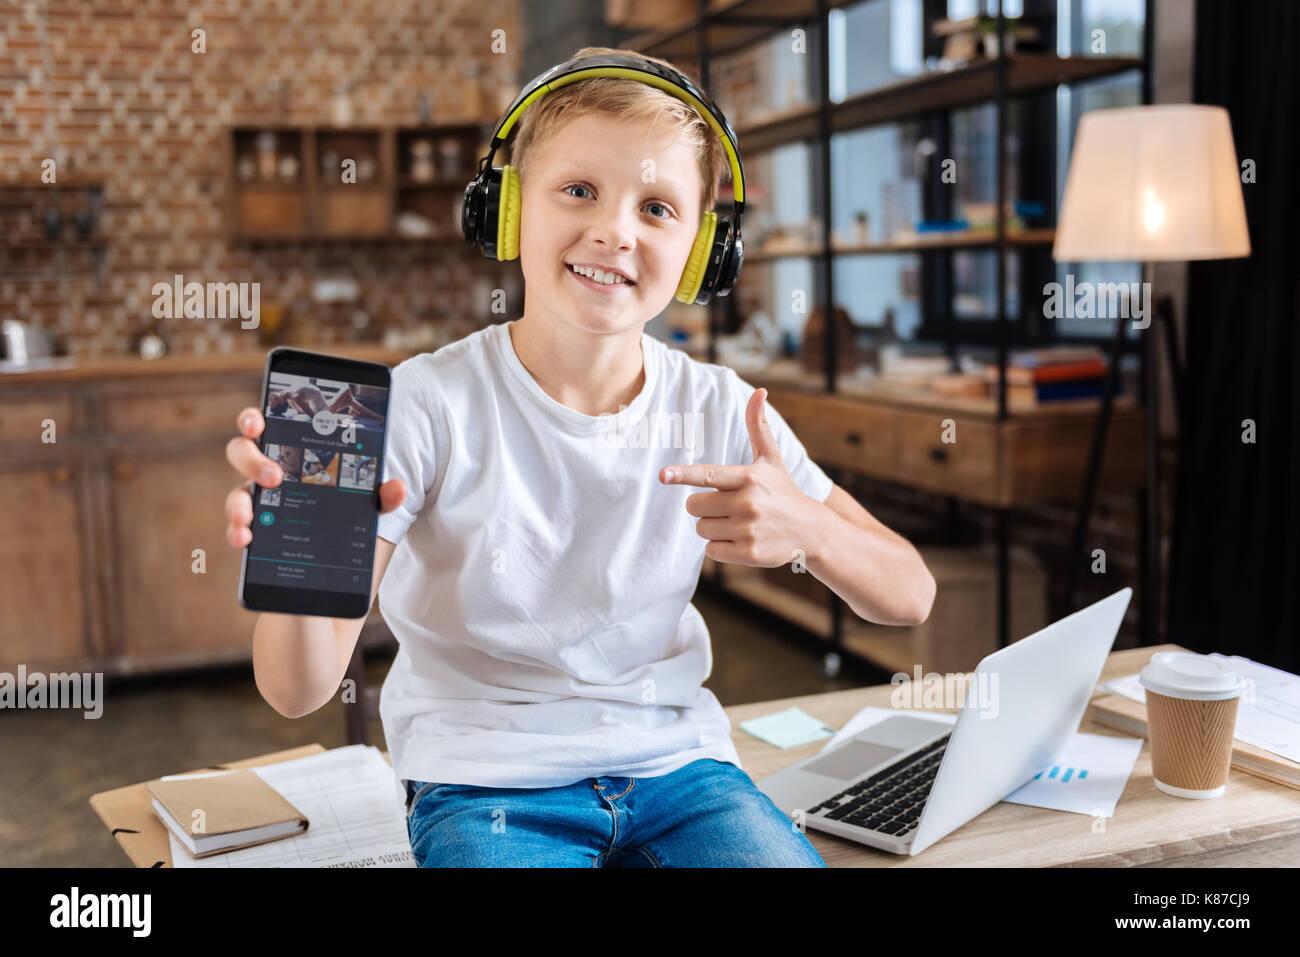 Smiling boy showing his favorite music streaming app - Stock Image